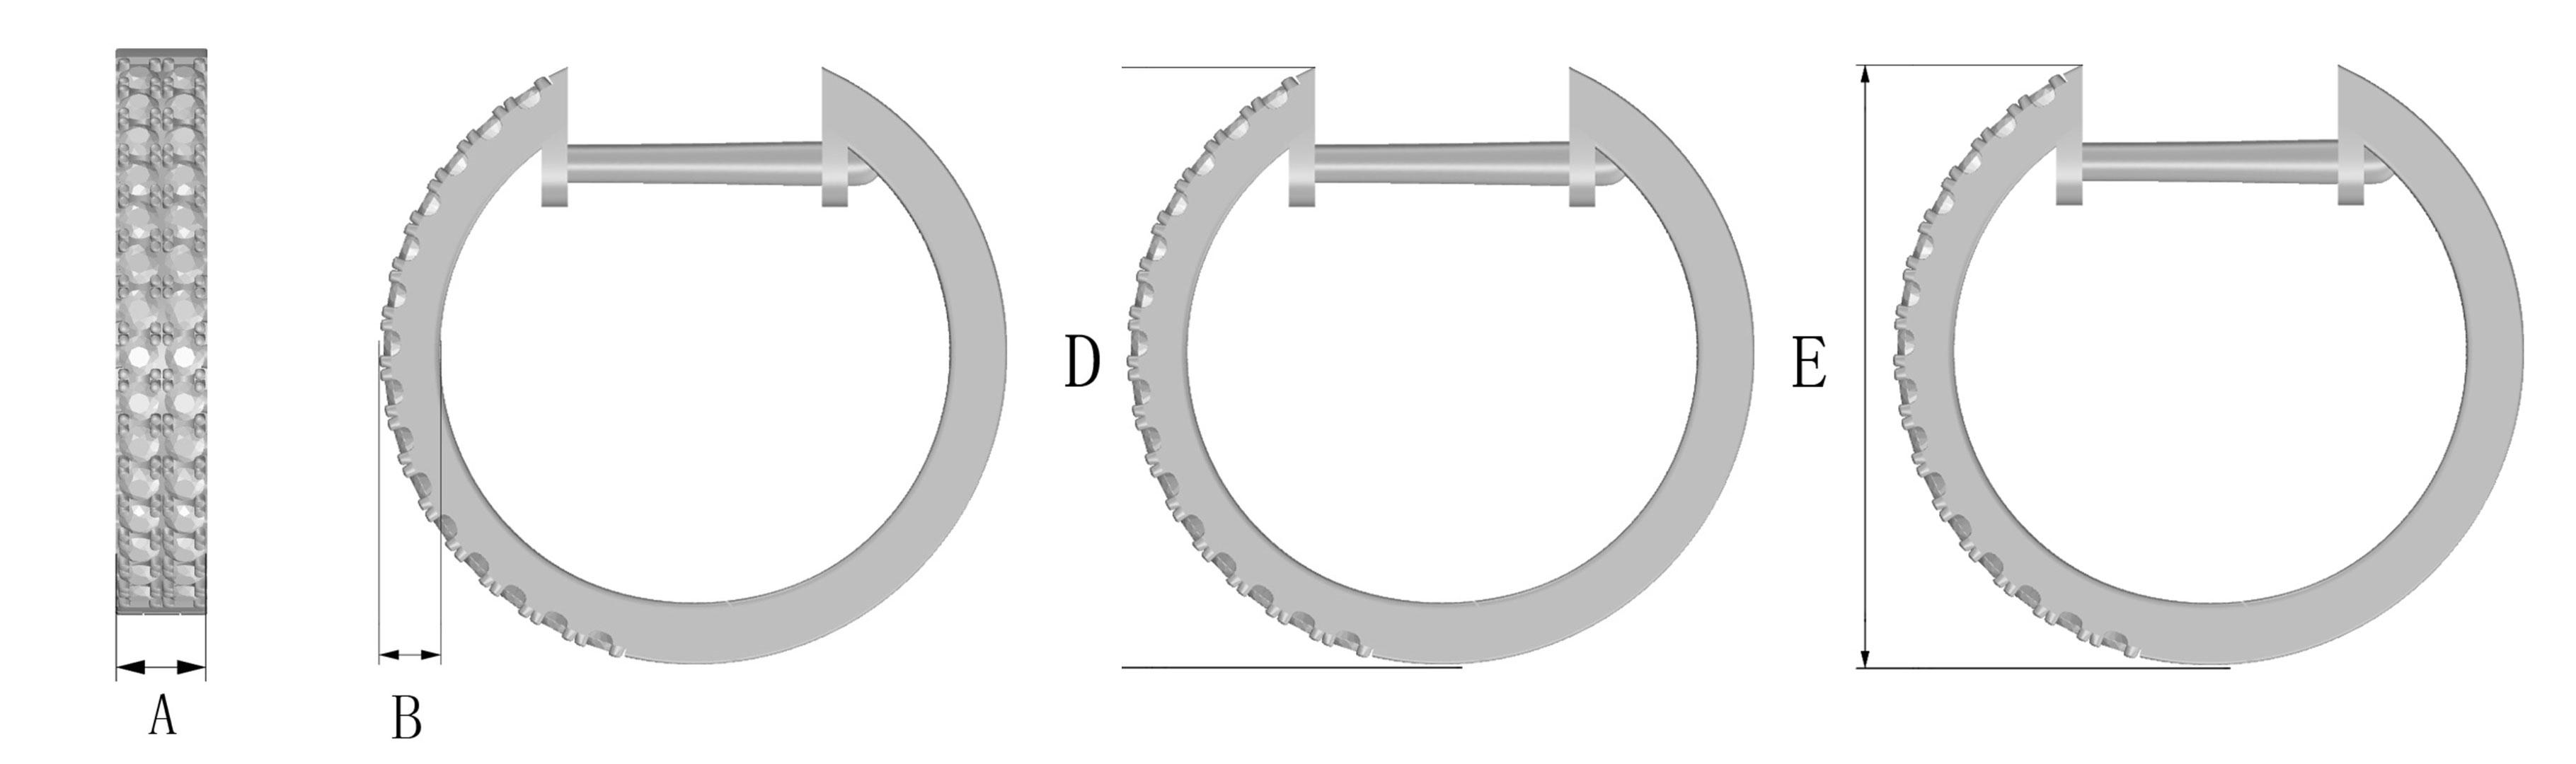 Huggie Earrings Size Guide with Drop Size - Long Island